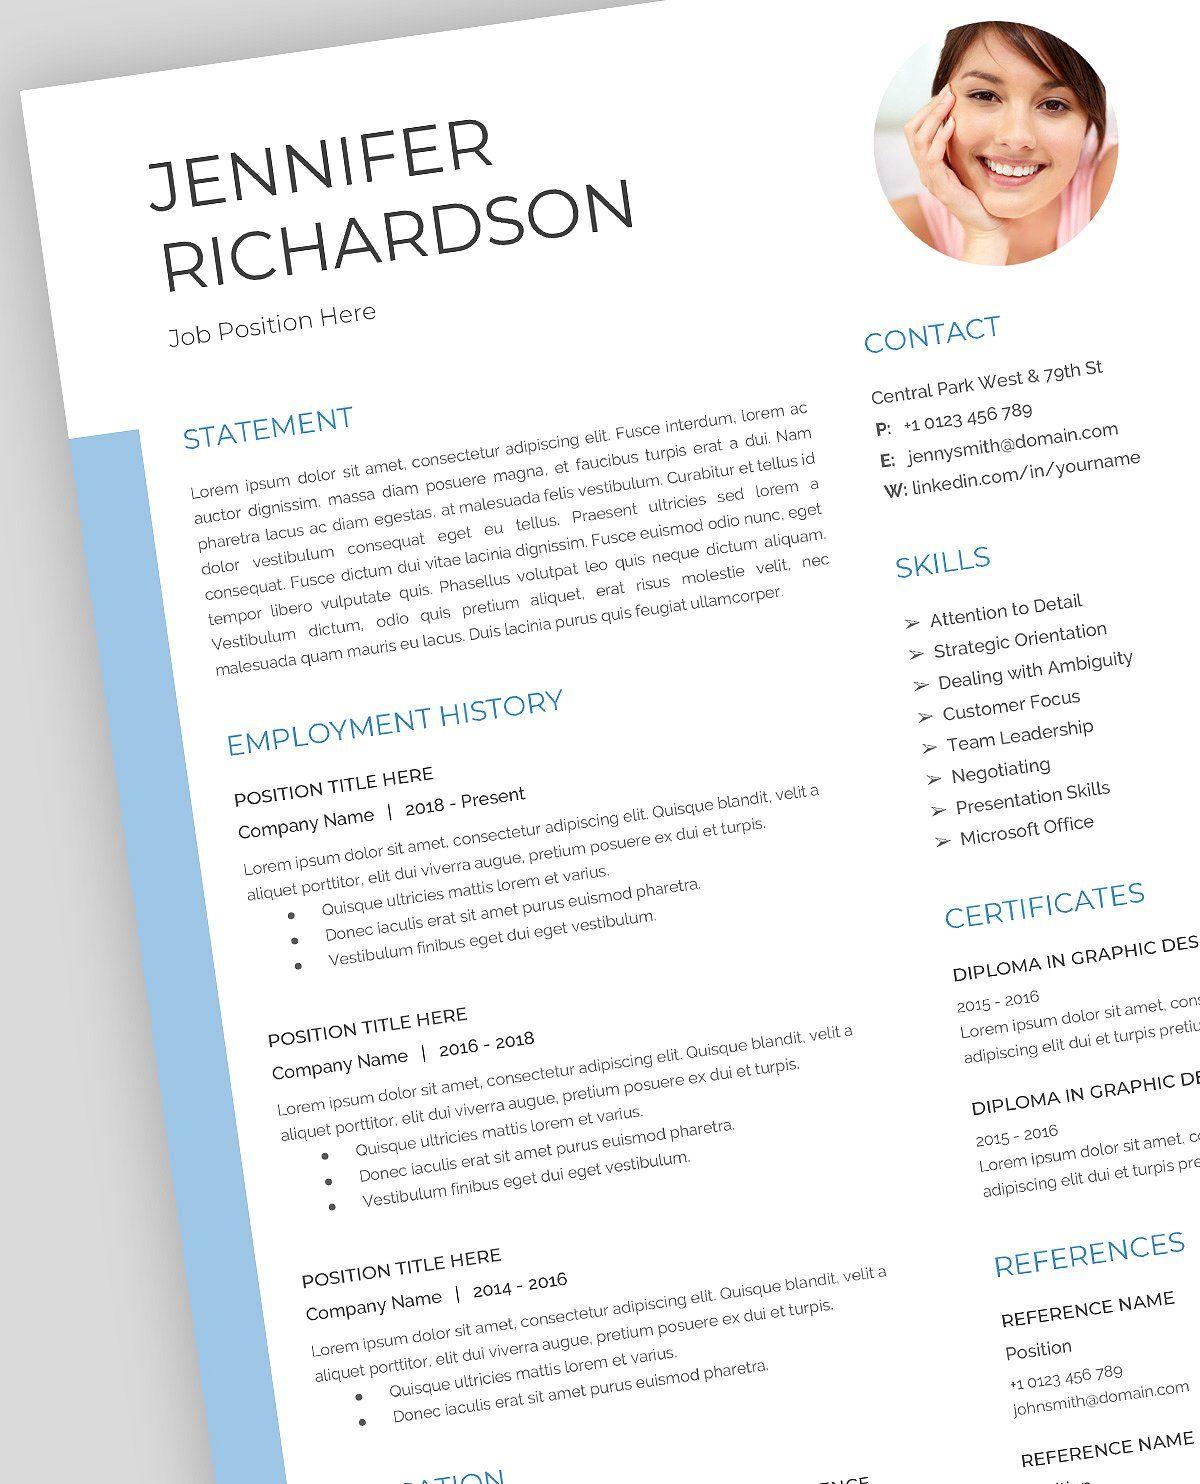 Resume Template, CV, Google Docs Resume template, Resume